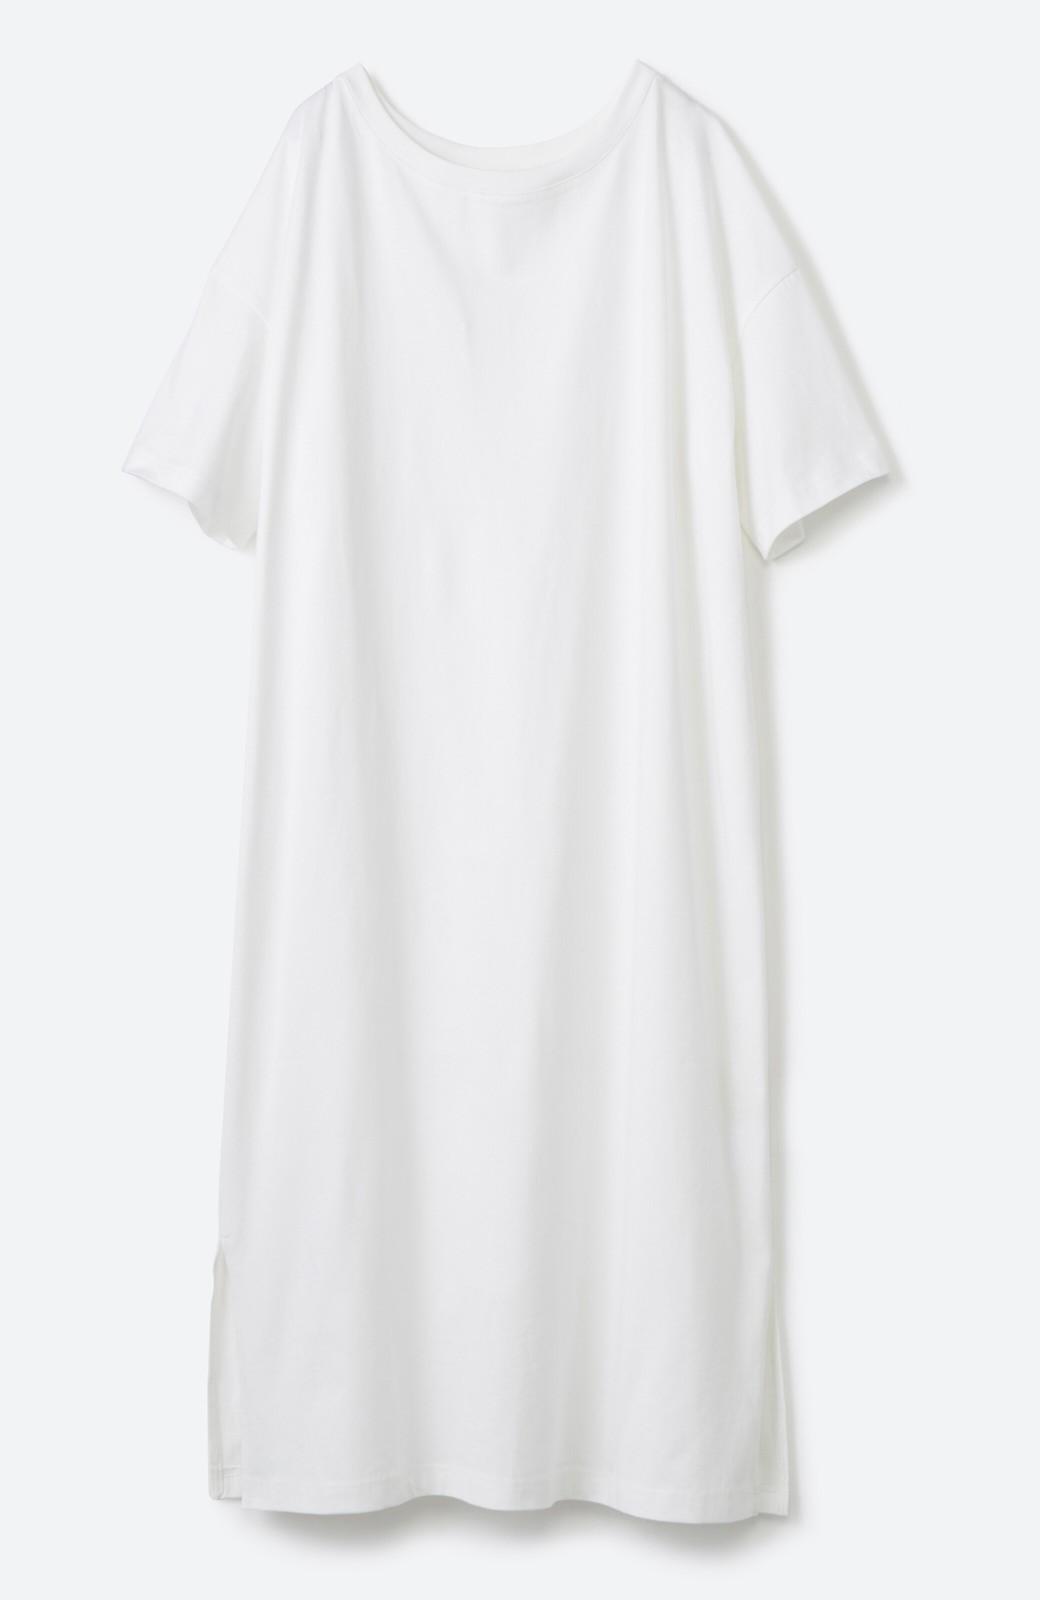 haco! 【ずぼら党】すぽっと着るだけ即完成! ずぼらさんのための気取らず着られて洗濯機洗いできるワンピ2枚セット <ホワイト×ネイビー>の商品写真32